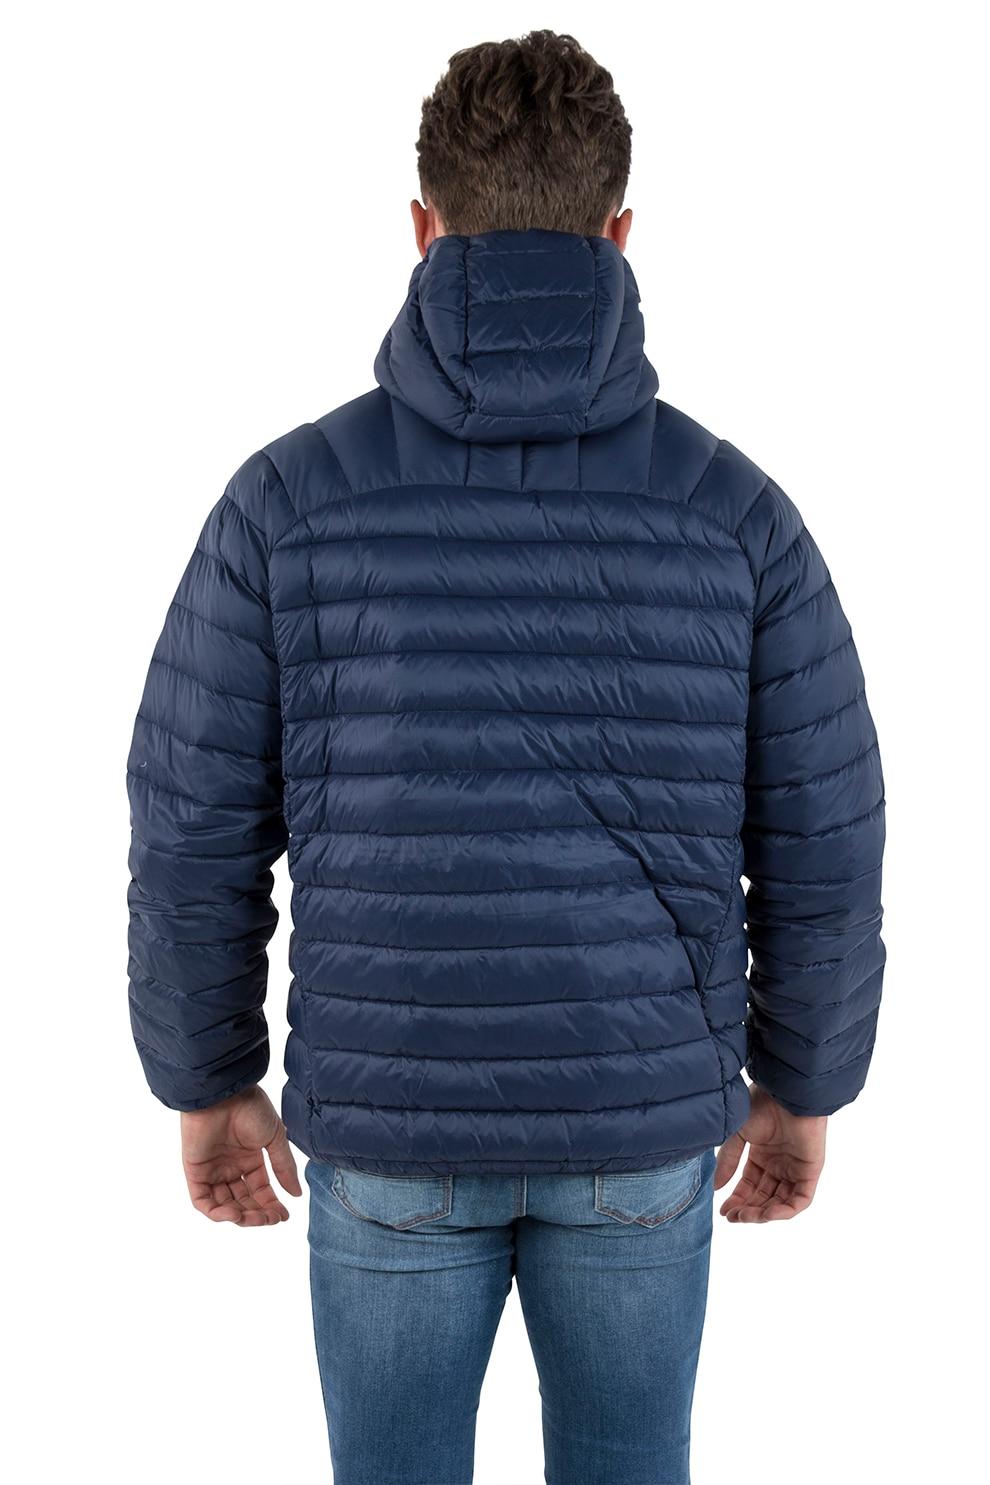 adidas Varilite Down Jacket Férfi steppelt dzseki XXL eMAG.hu